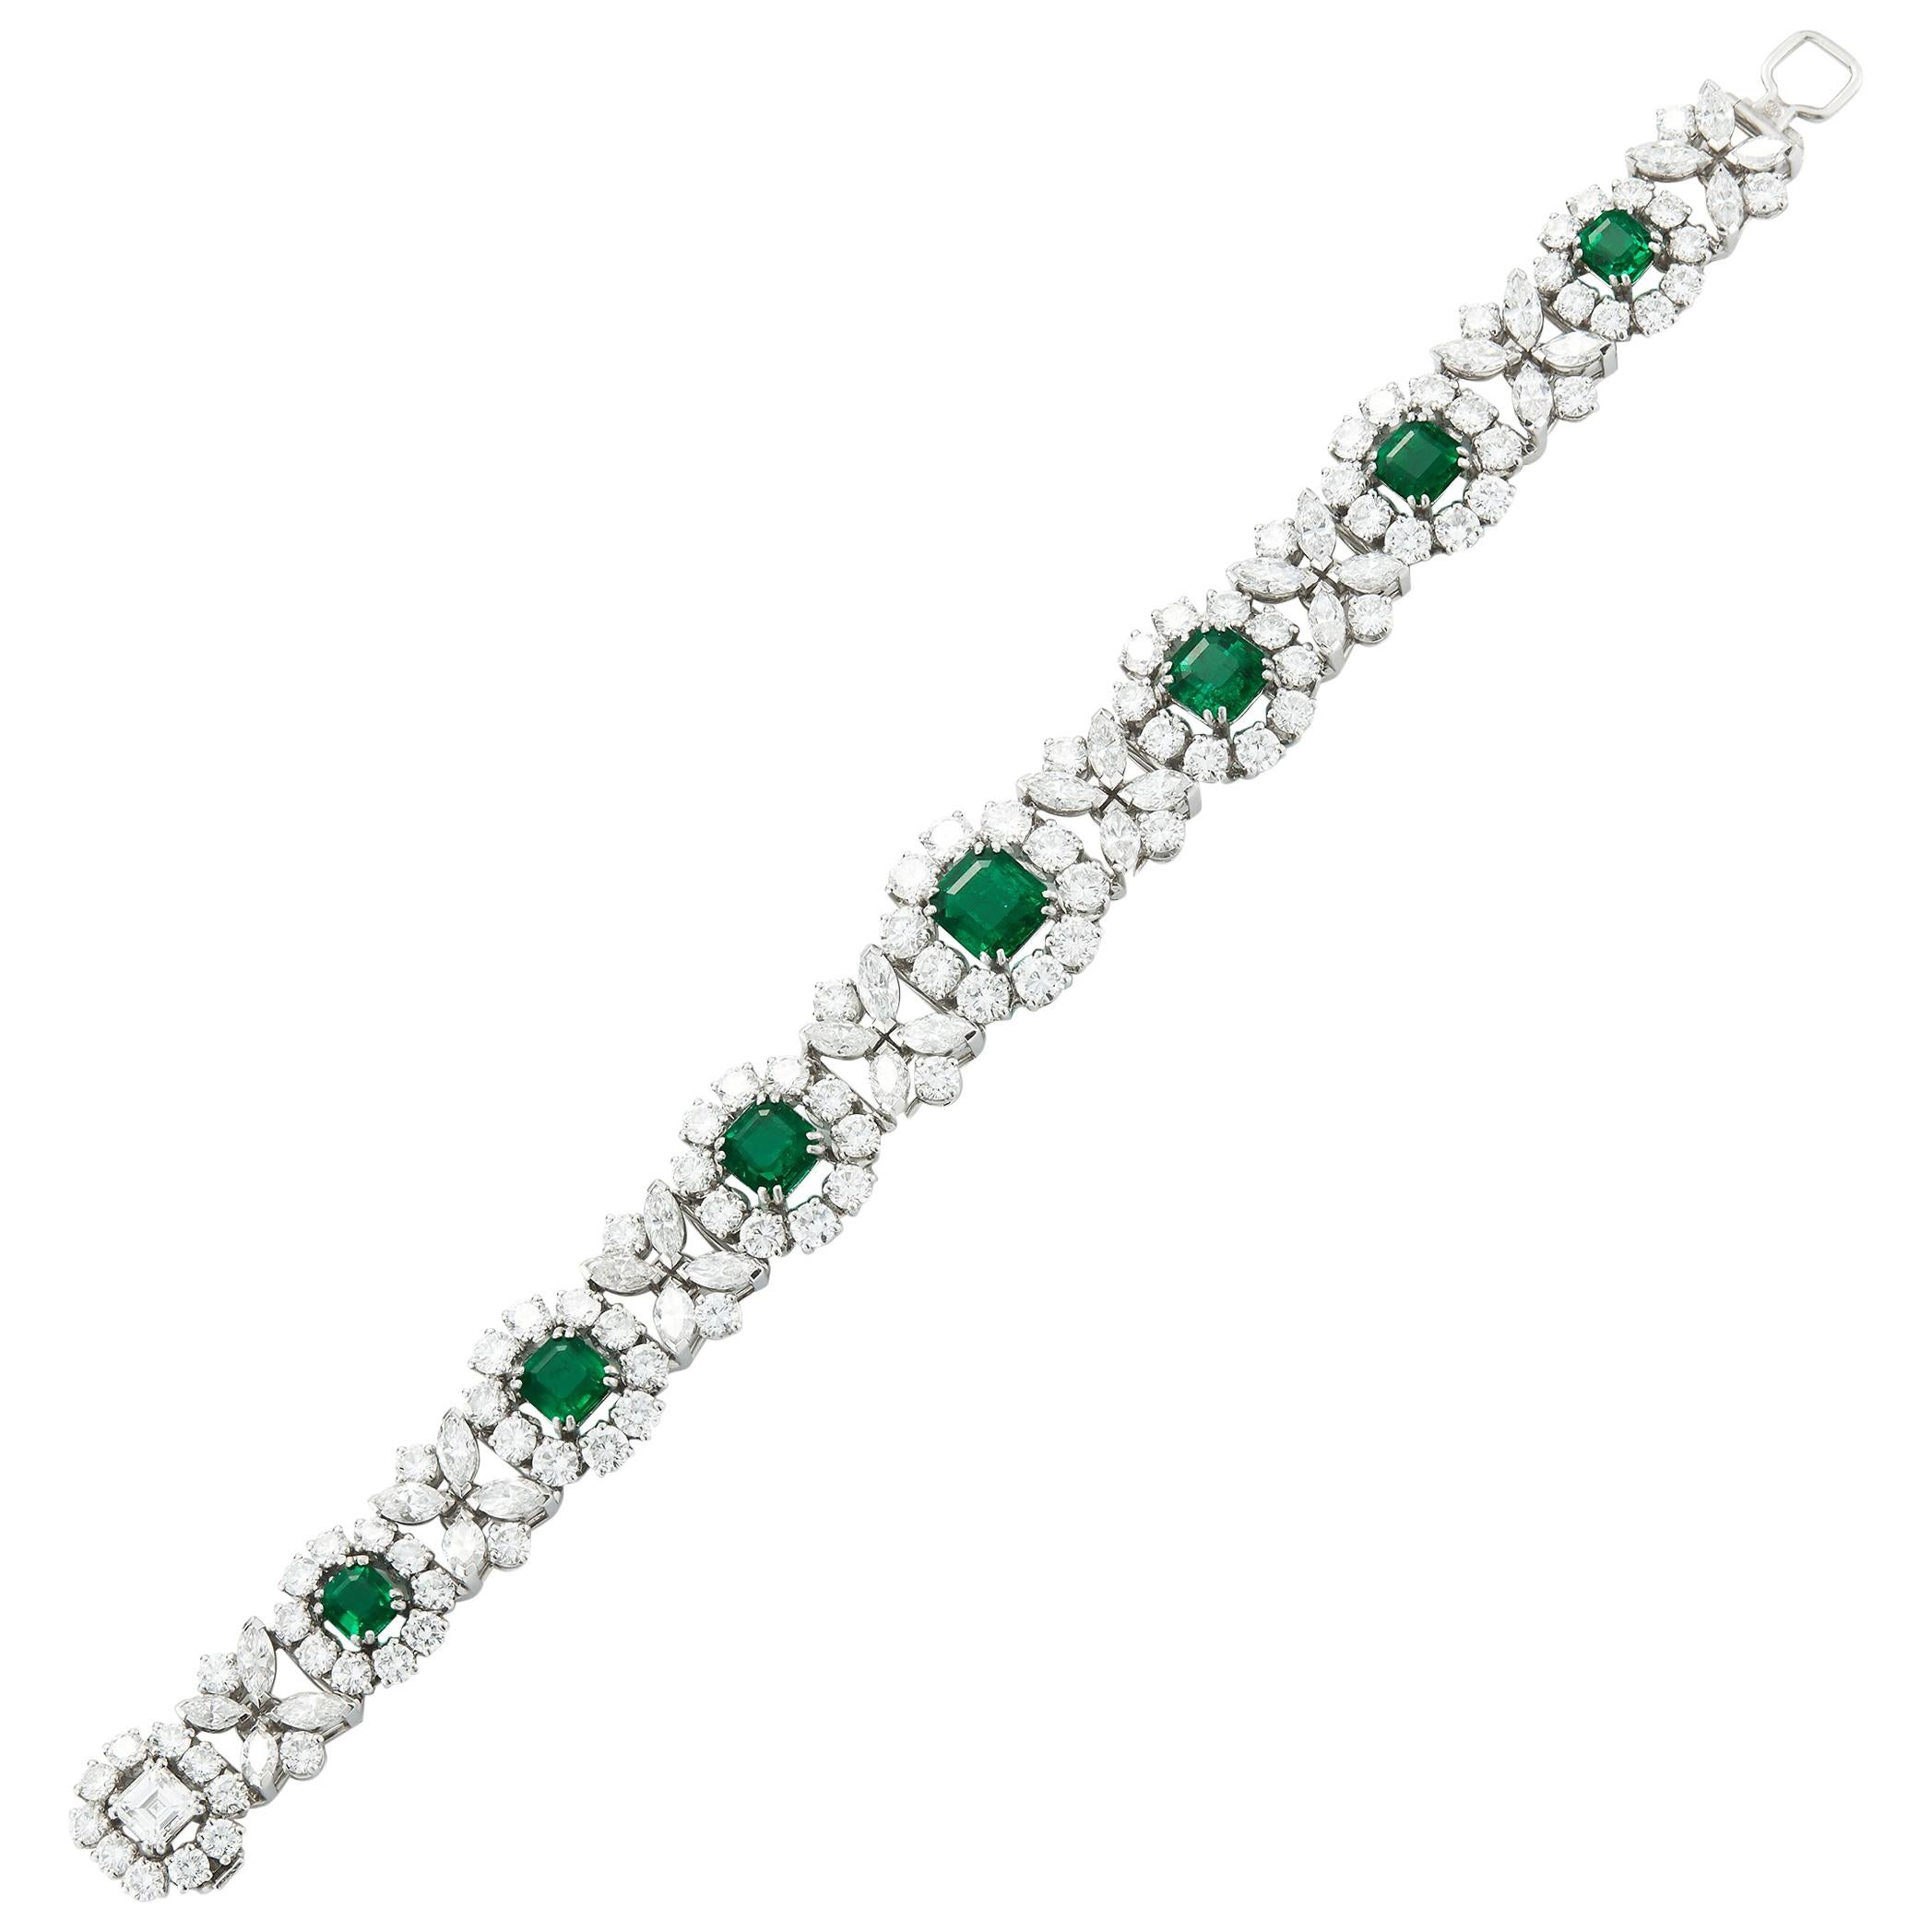 Magnificent Diamond and Columbian Emerald Bracelet